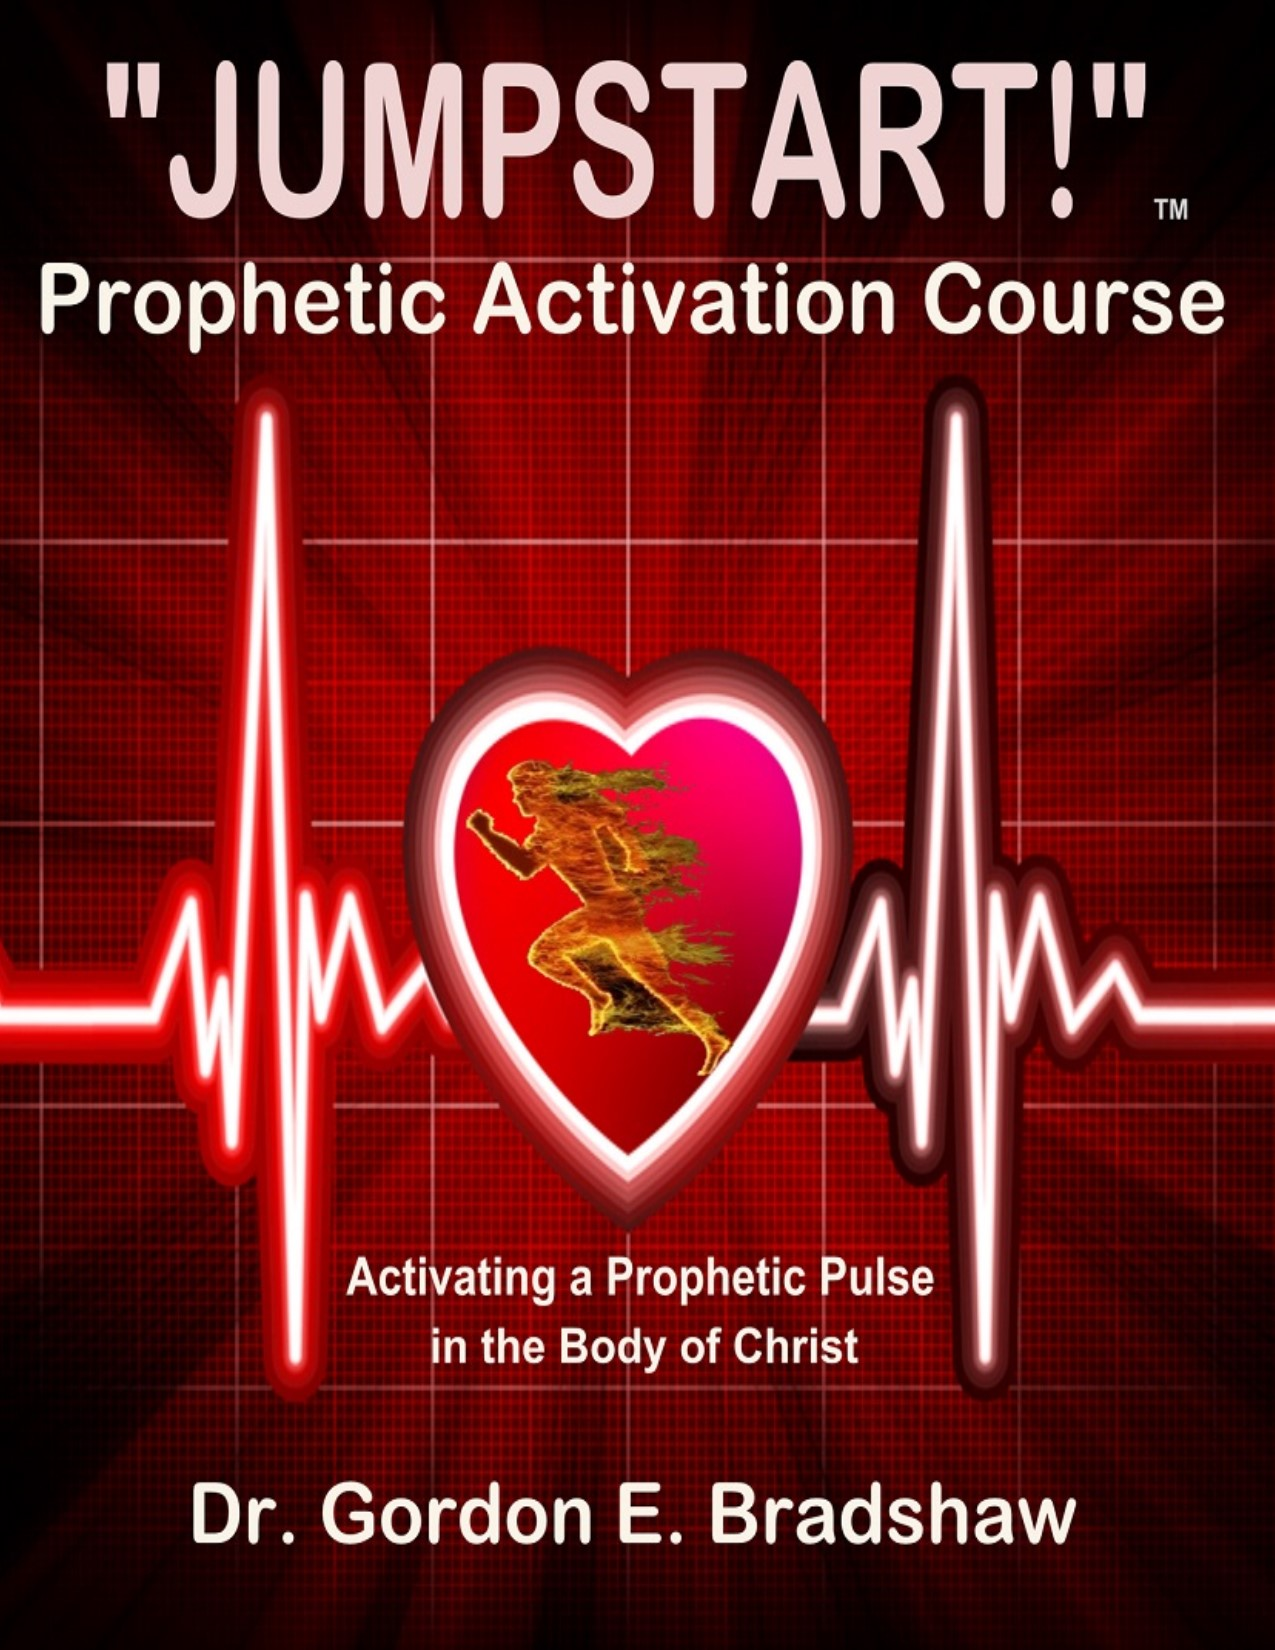 JUMPSTART!  Prophetic Activation Course